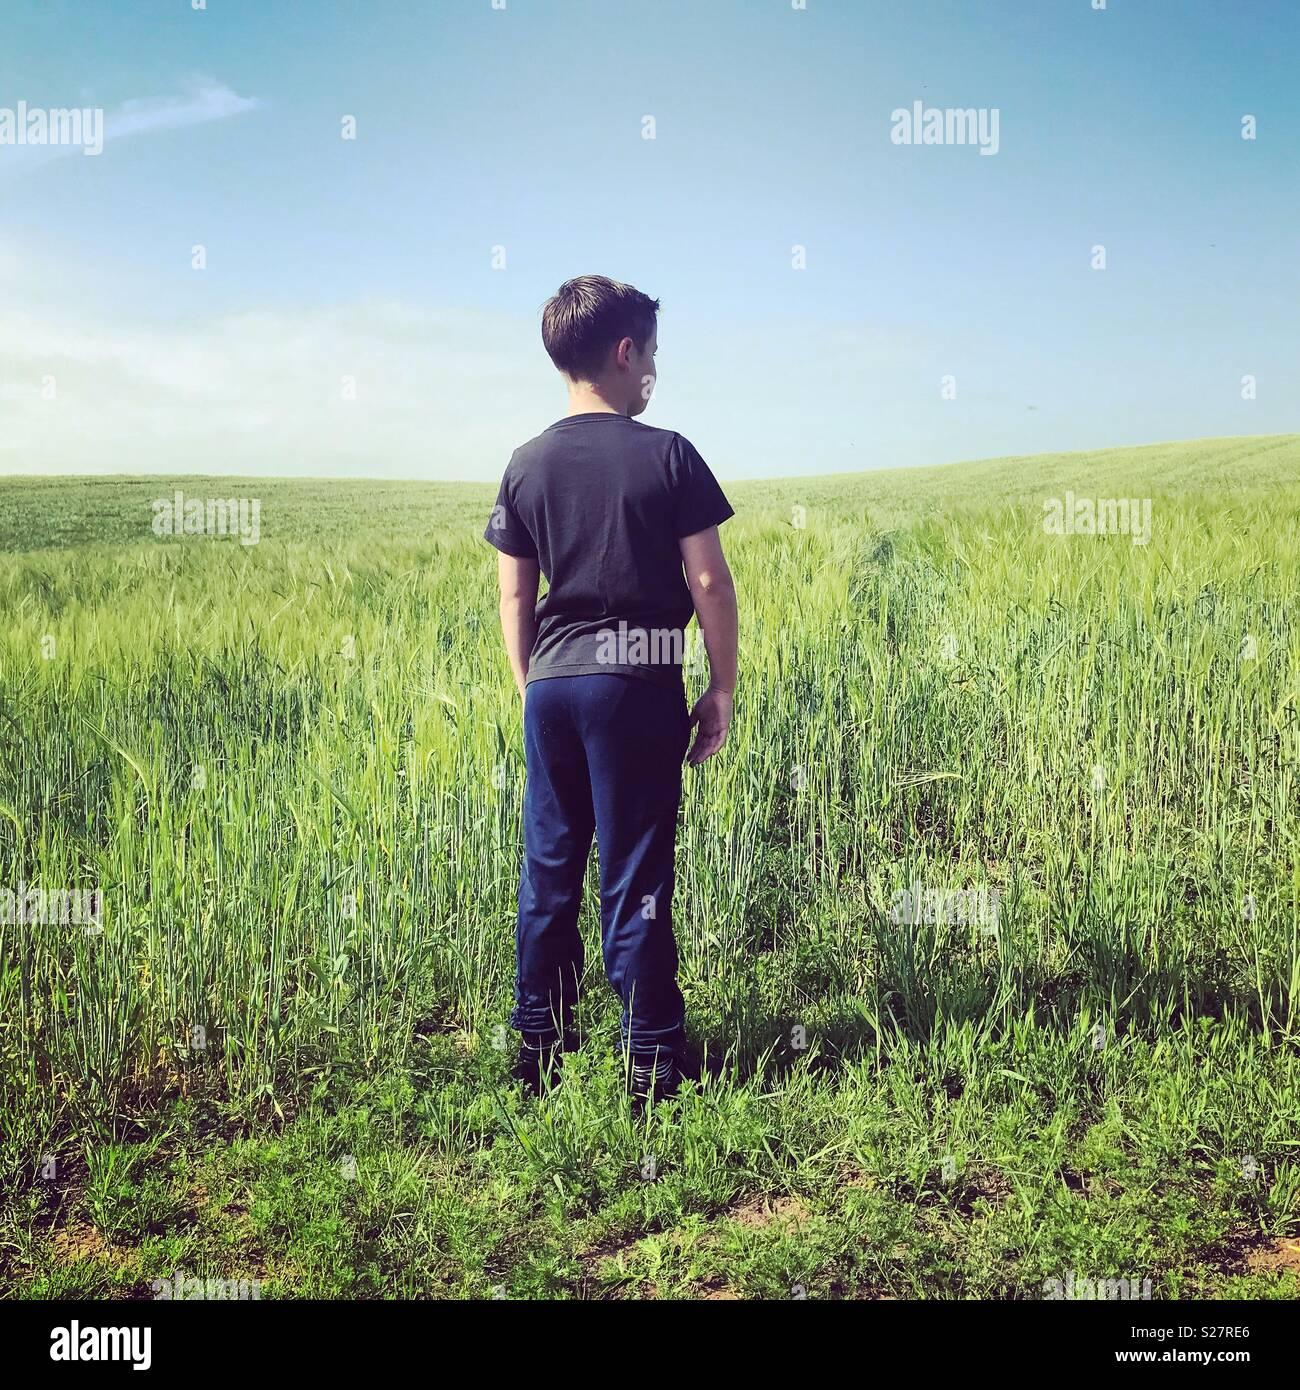 Pre teen boy standing in a field in Summertime - Stock Image